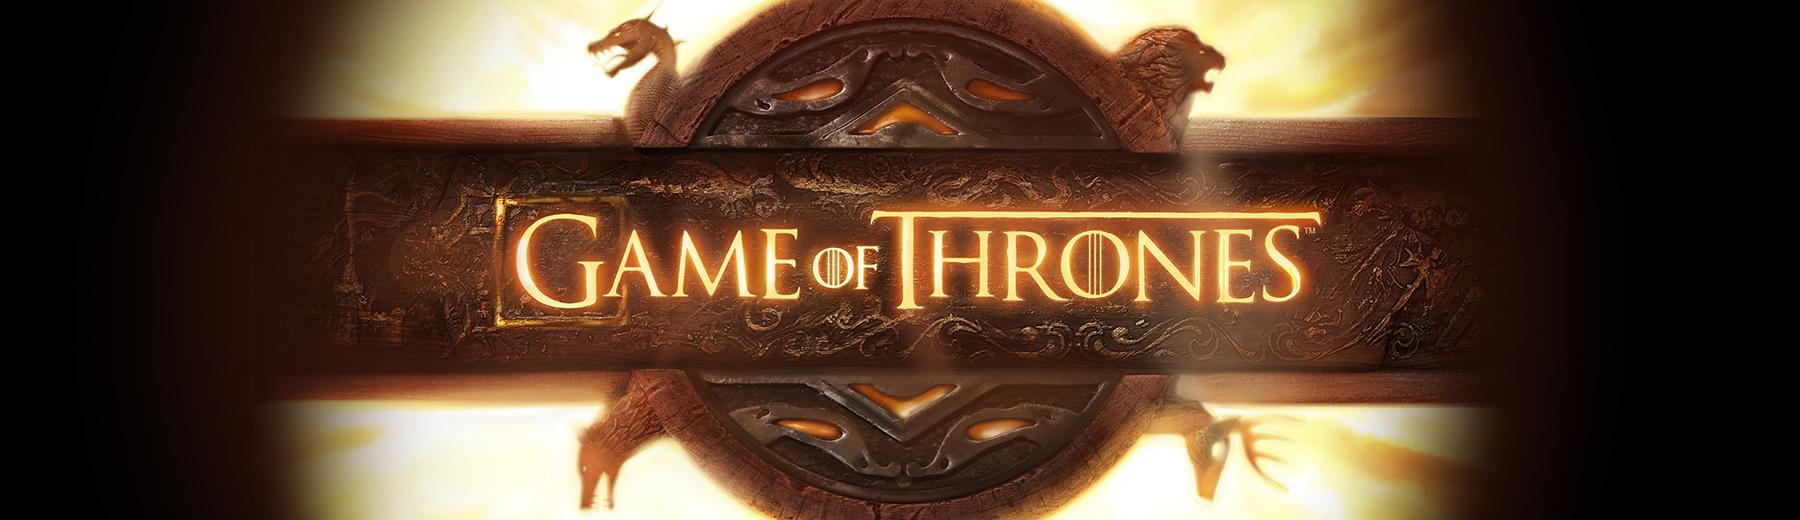 Game Of Thrones Deko wolfkopf game of thrones tierwelt natur skulptur an die wand deko figur